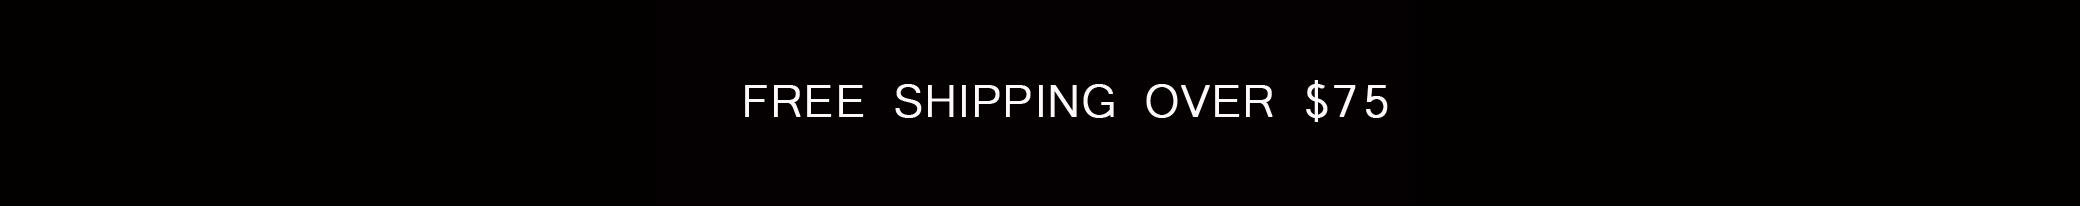 freeshippinglong.png